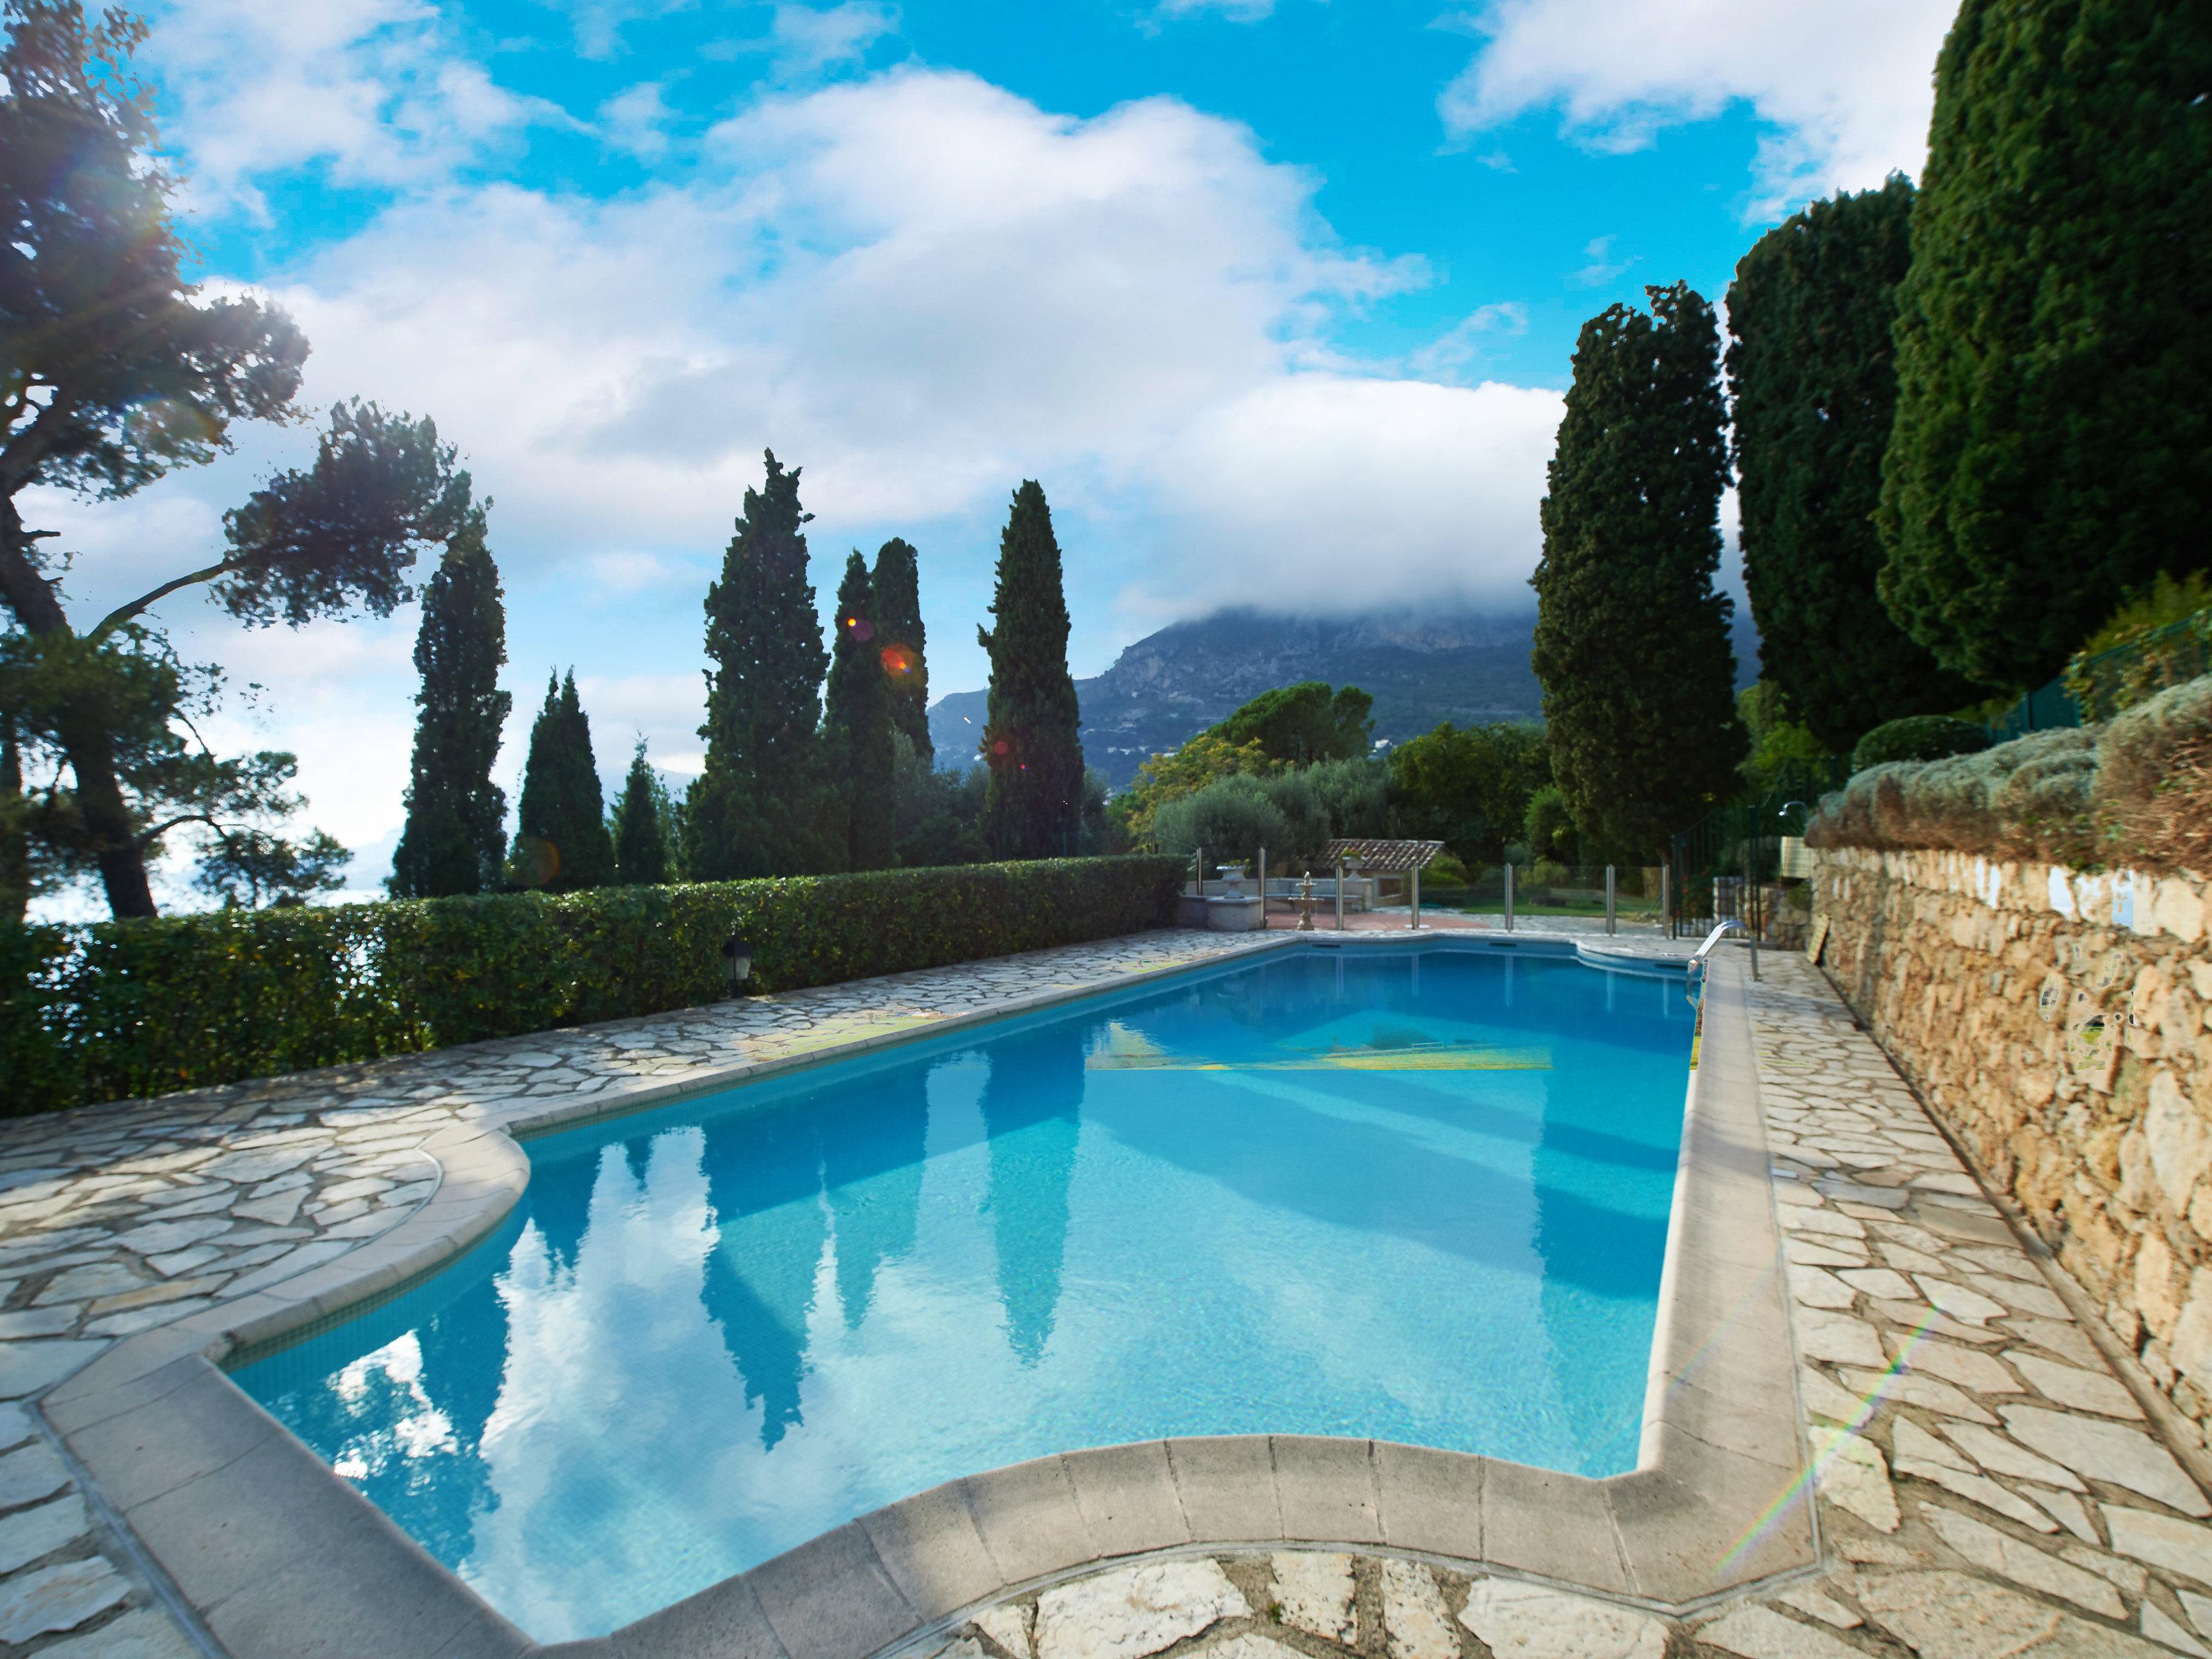 Duplex for Sale at Prestigious duplex close to Monaco in historical building with pool Roquebrune Cap Martin, Provence-Alpes-Cote D'Azur 06190 France